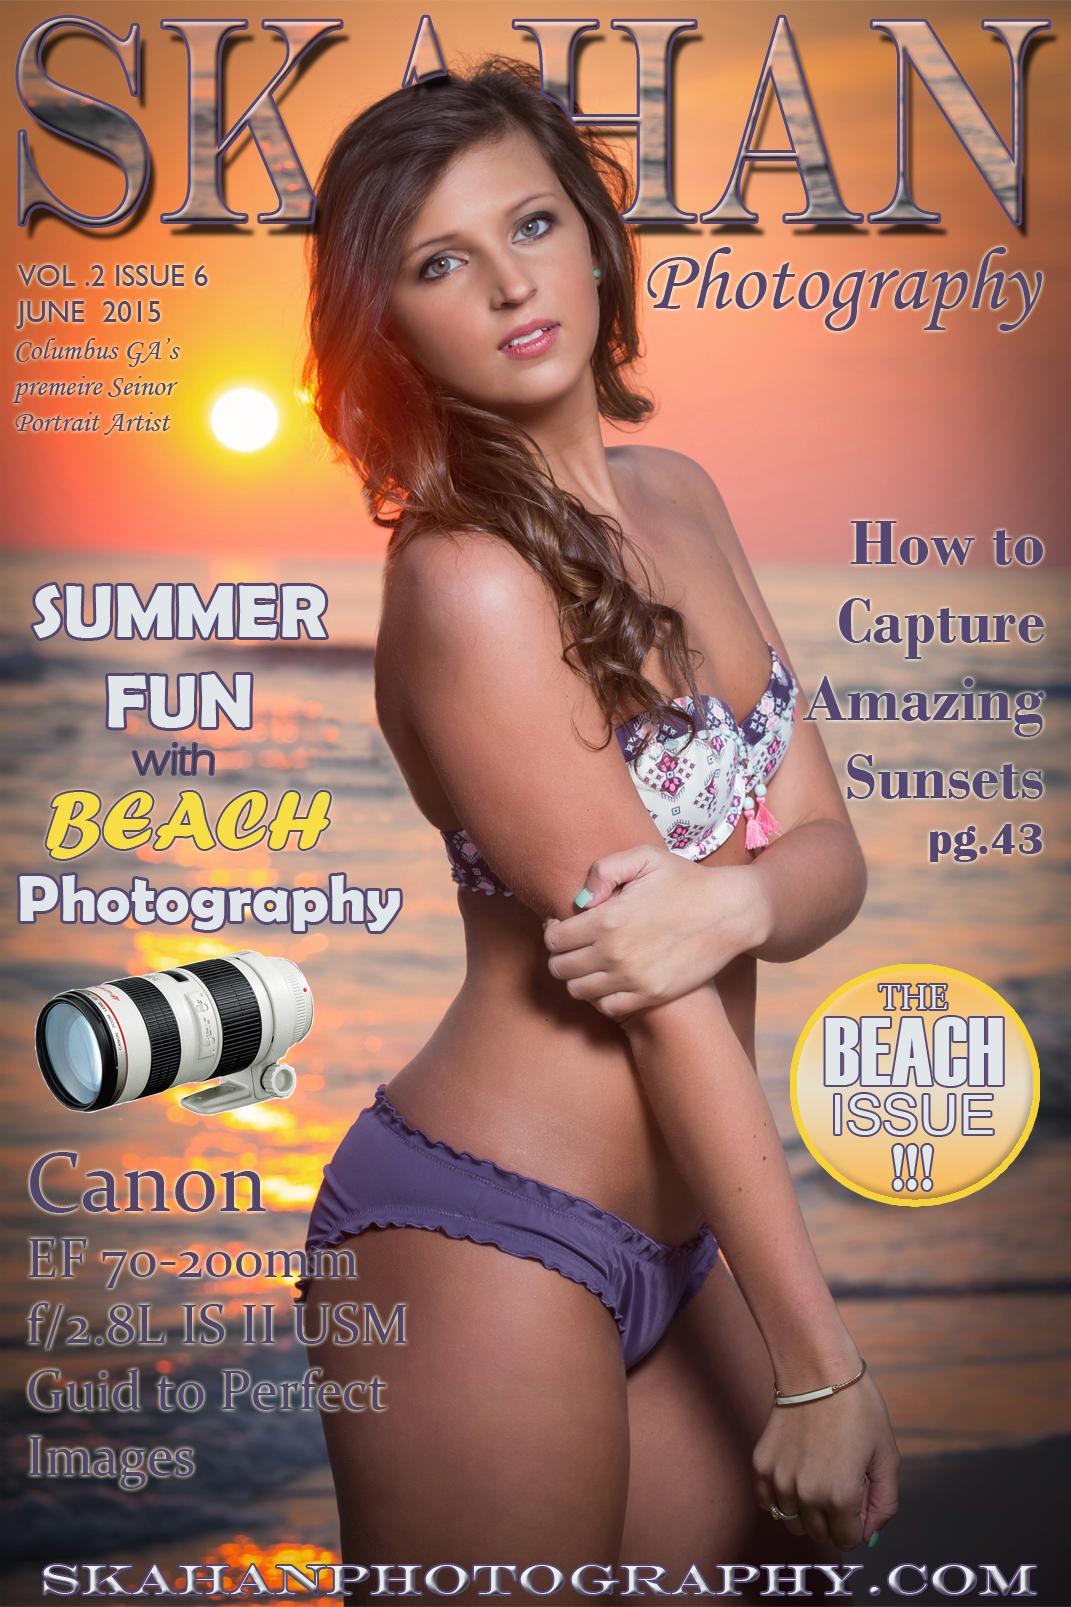 Volume 2 Issue 6 June 2015